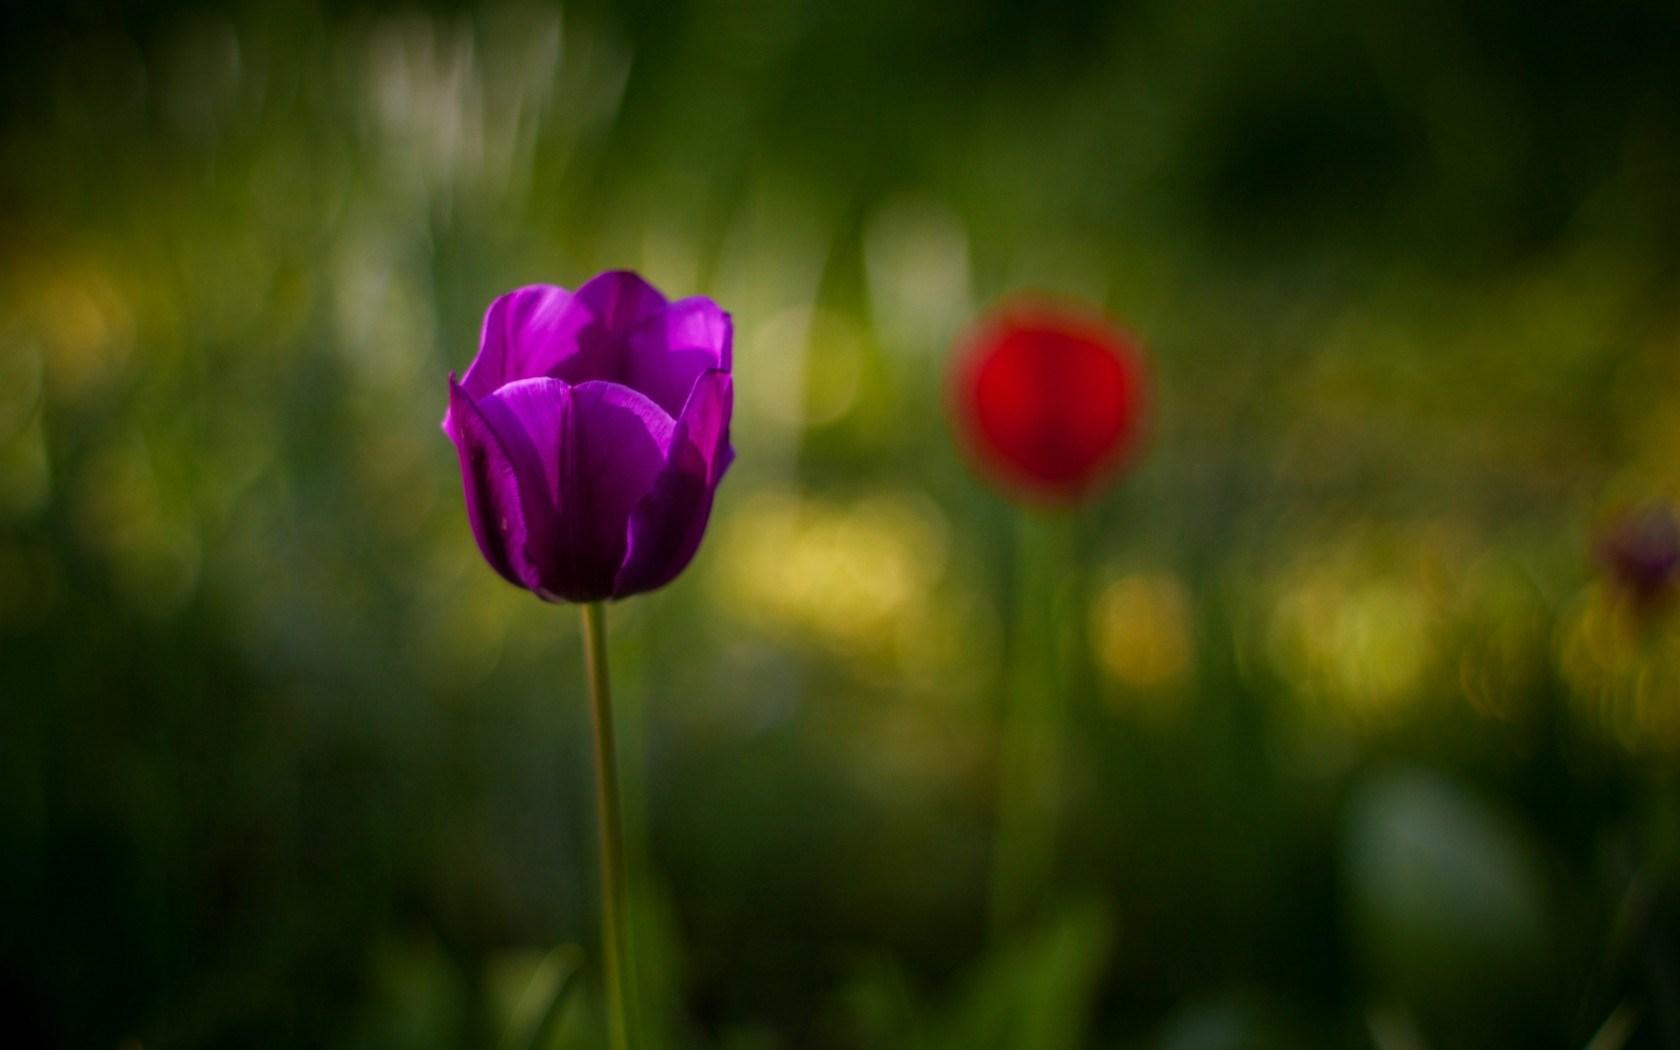 Tulip Purple Flower Close Up